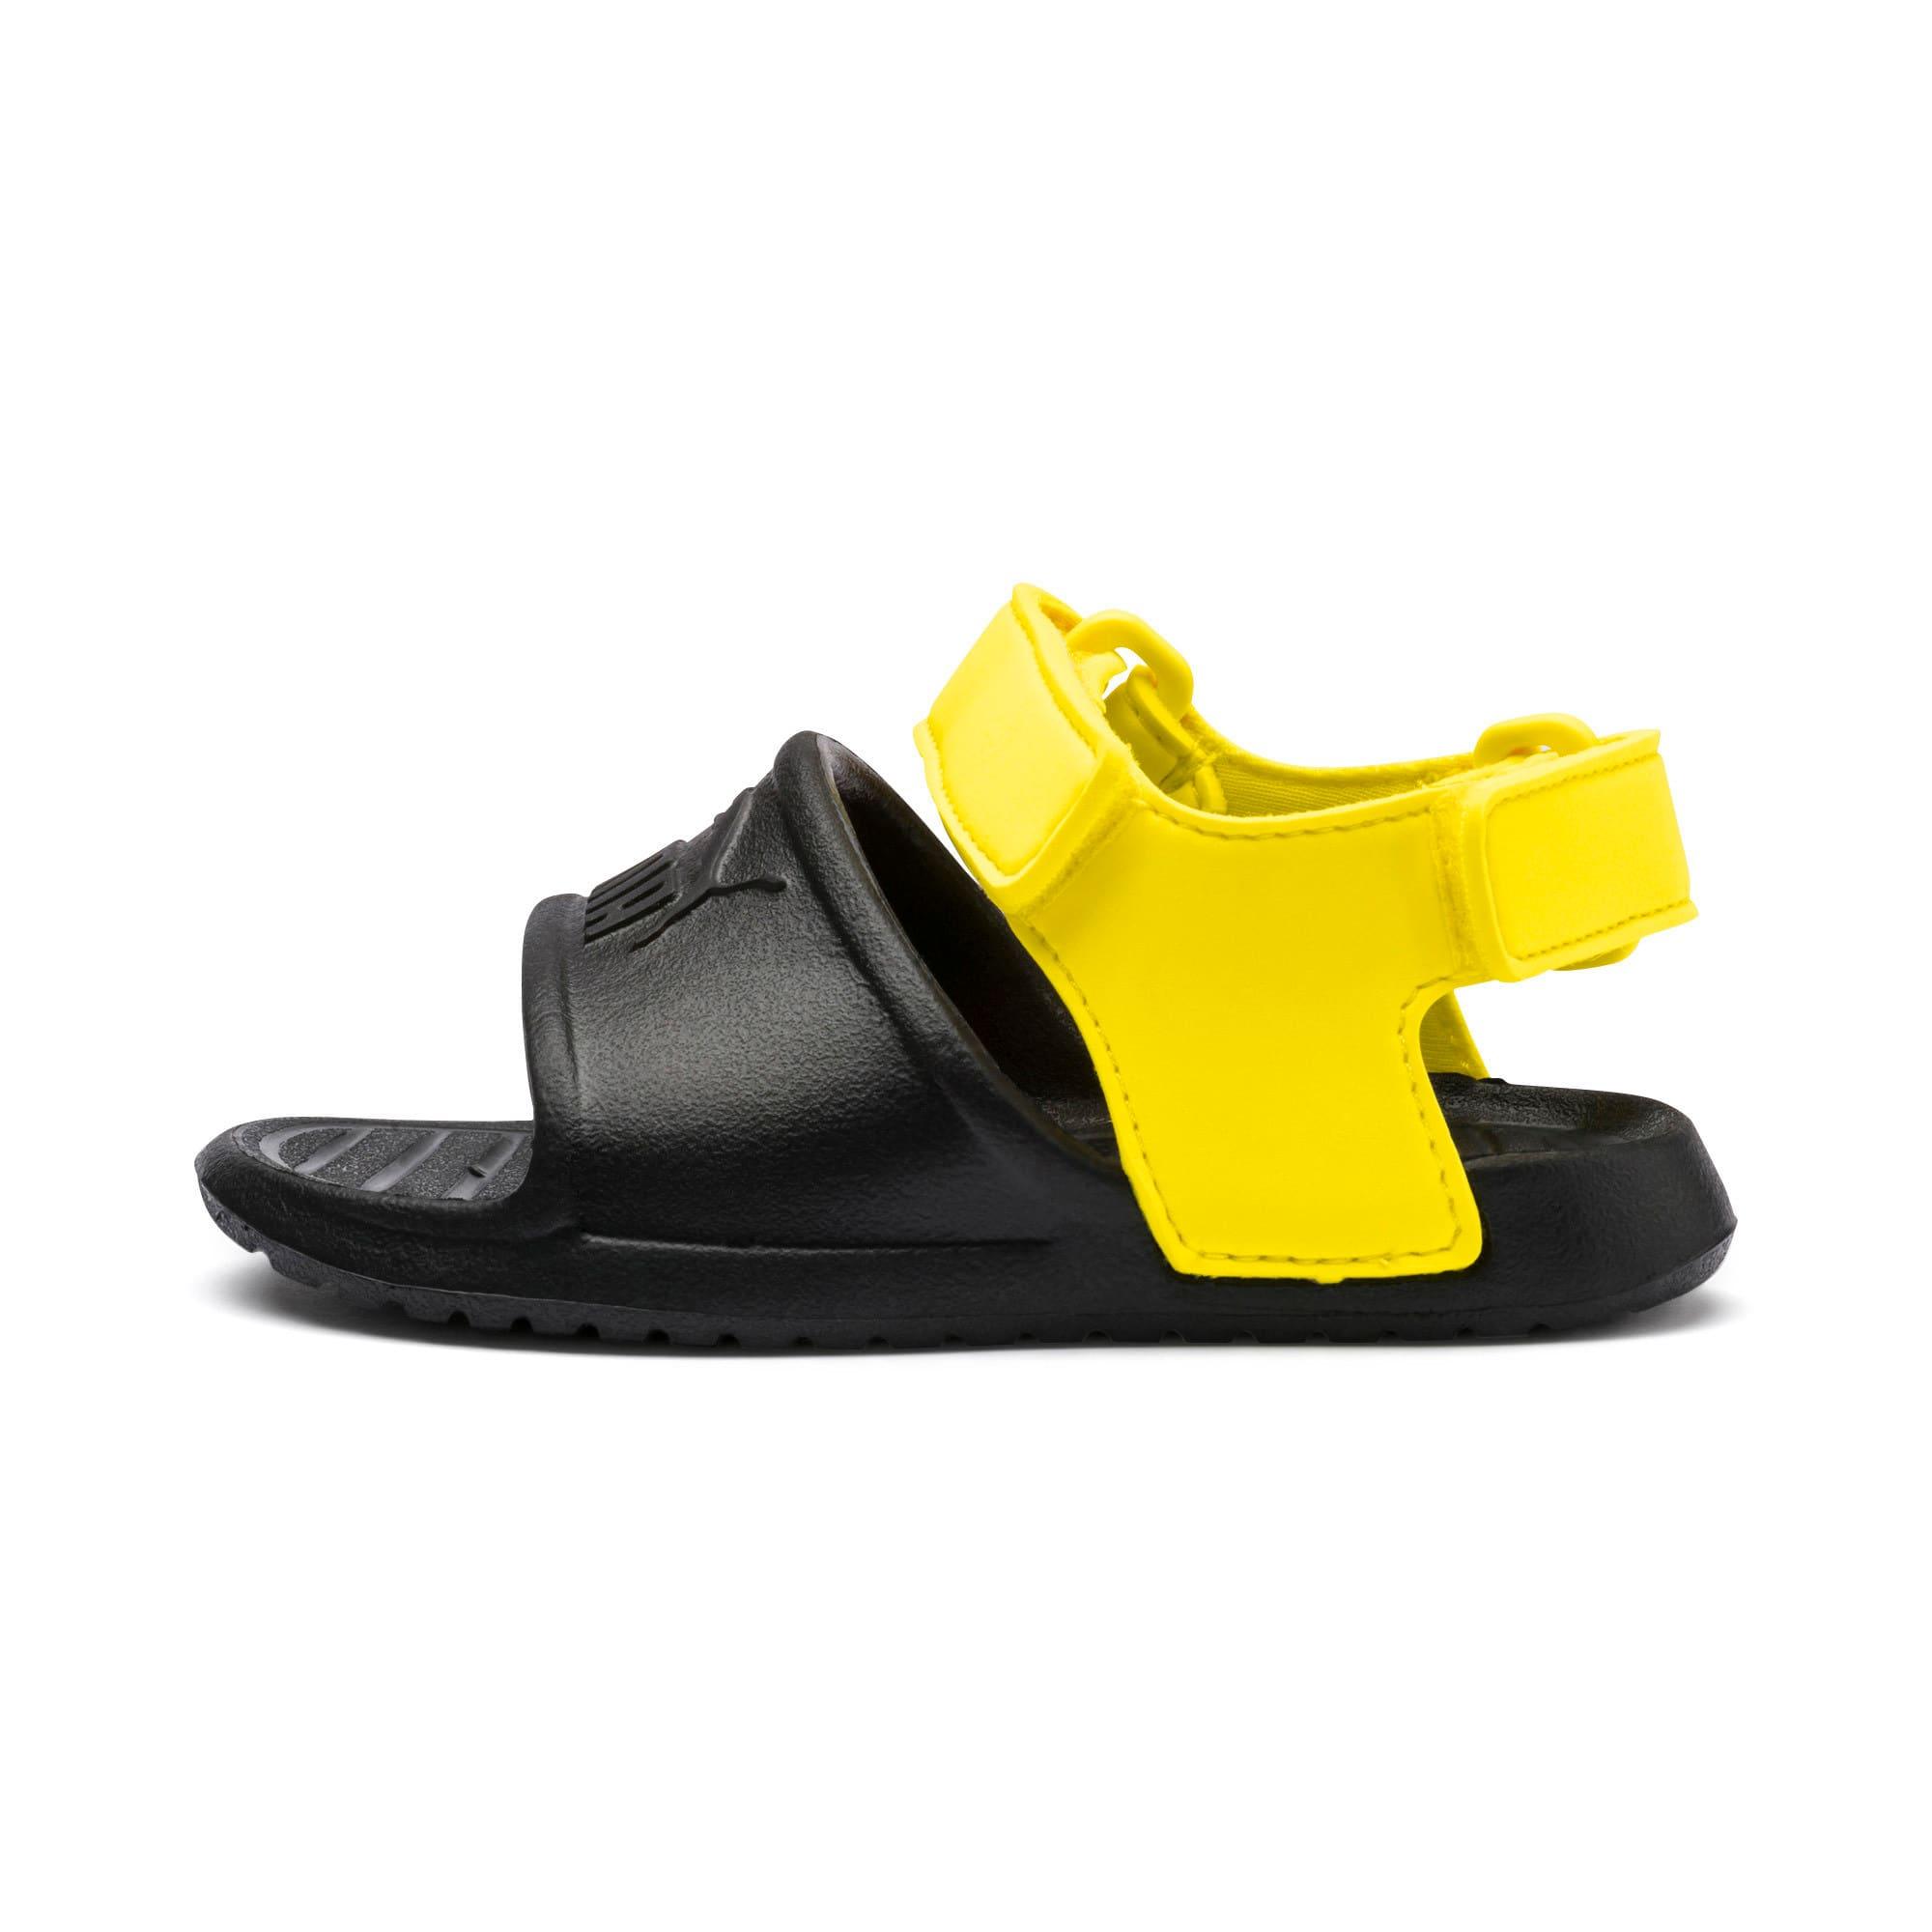 Thumbnail 1 of Divecat v2 Injex Kids' Sandals, Puma Black-Blazing Yellow, medium